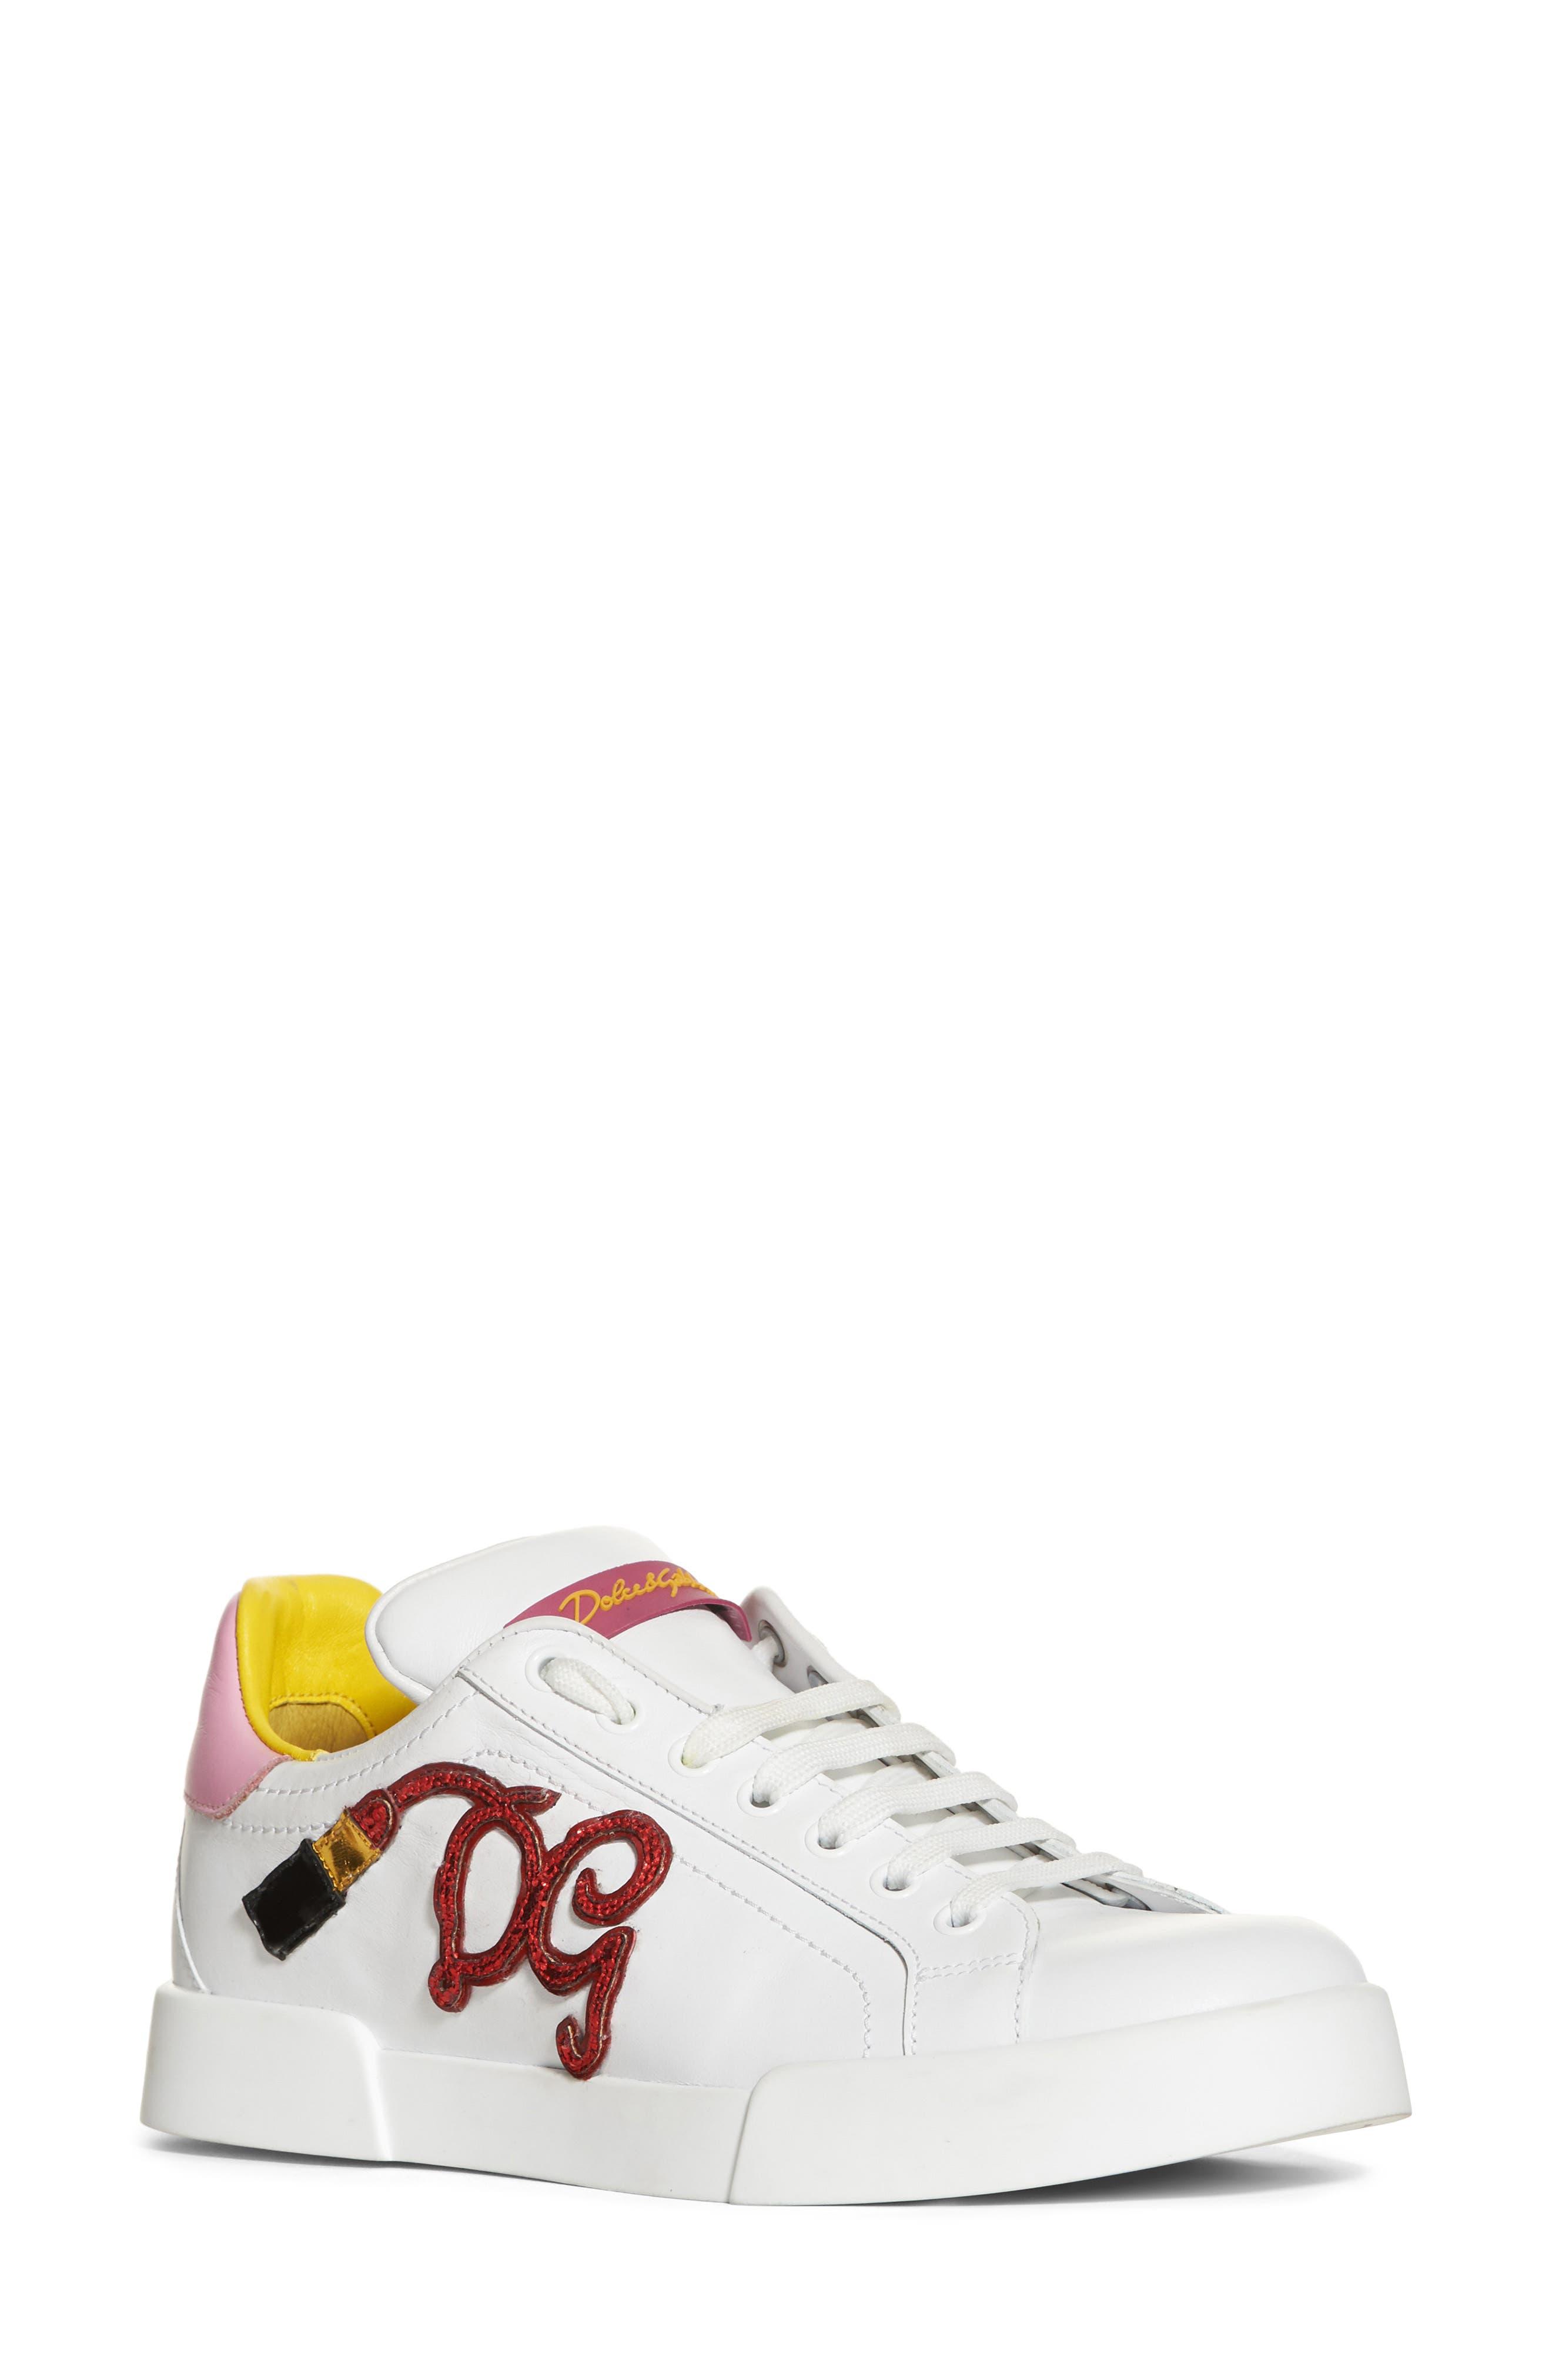 Main Image - Dolce&Gabbana Lipstick Sneaker (Women)